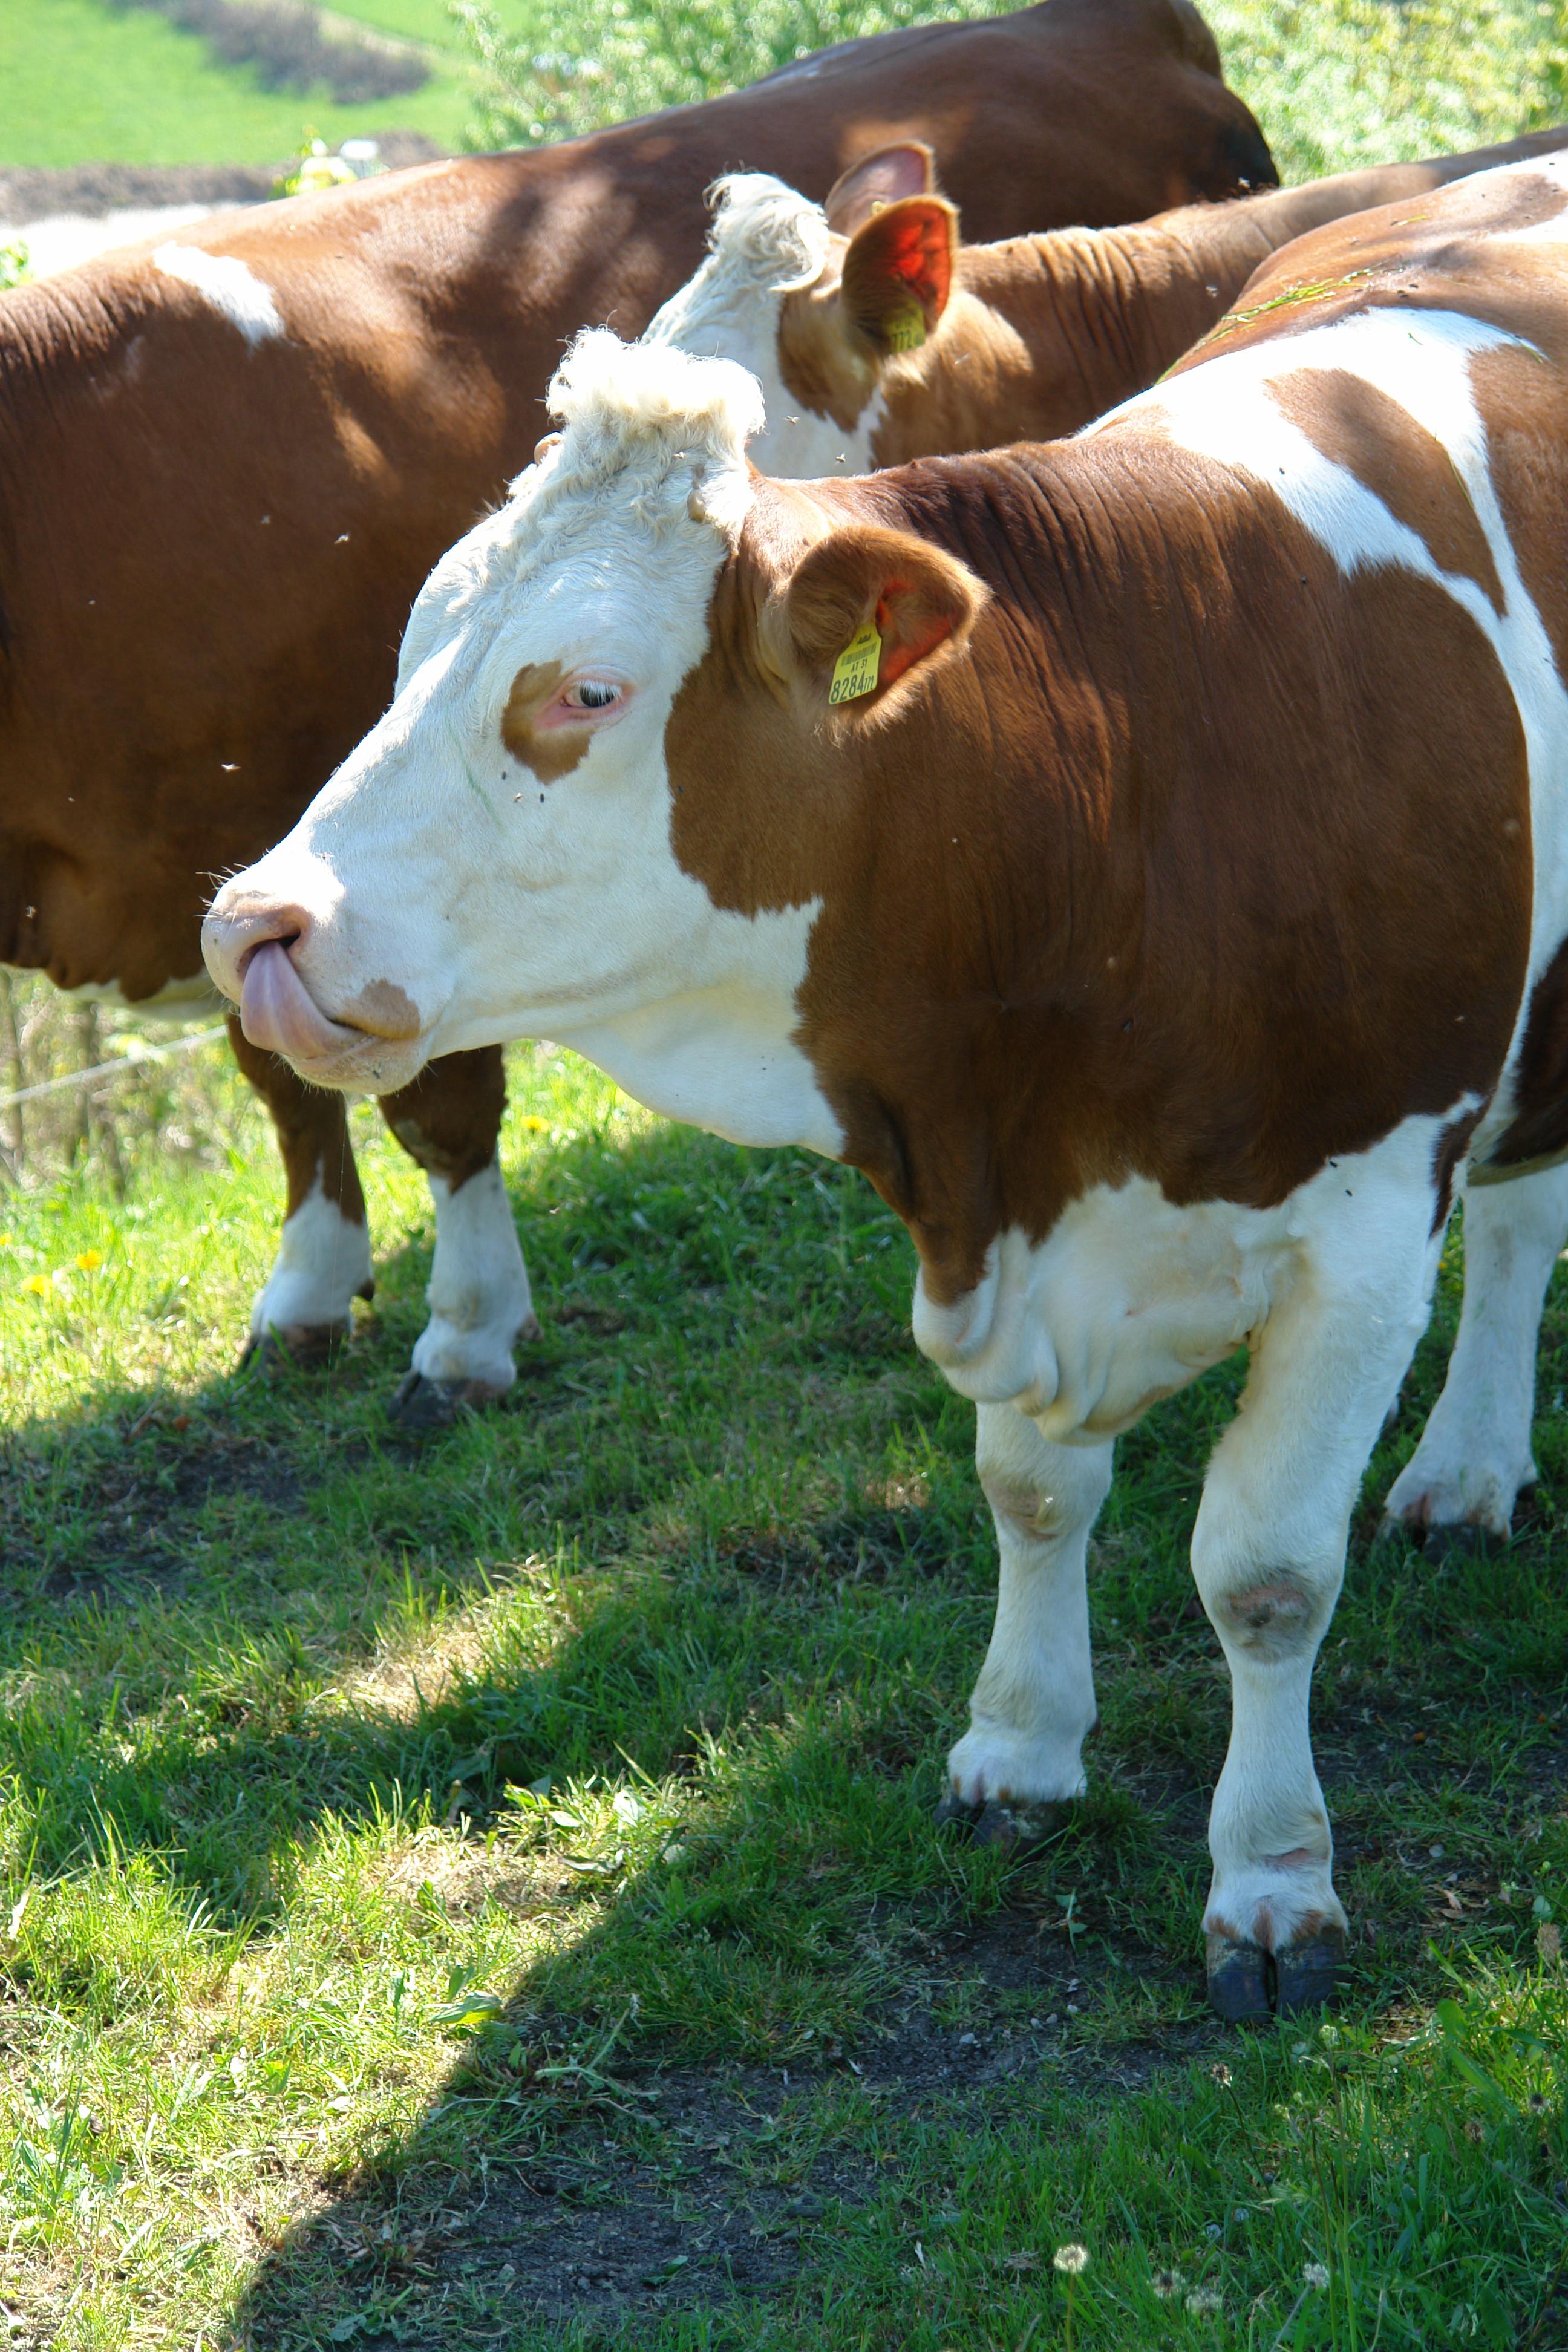 Kuh beim Naseputzen